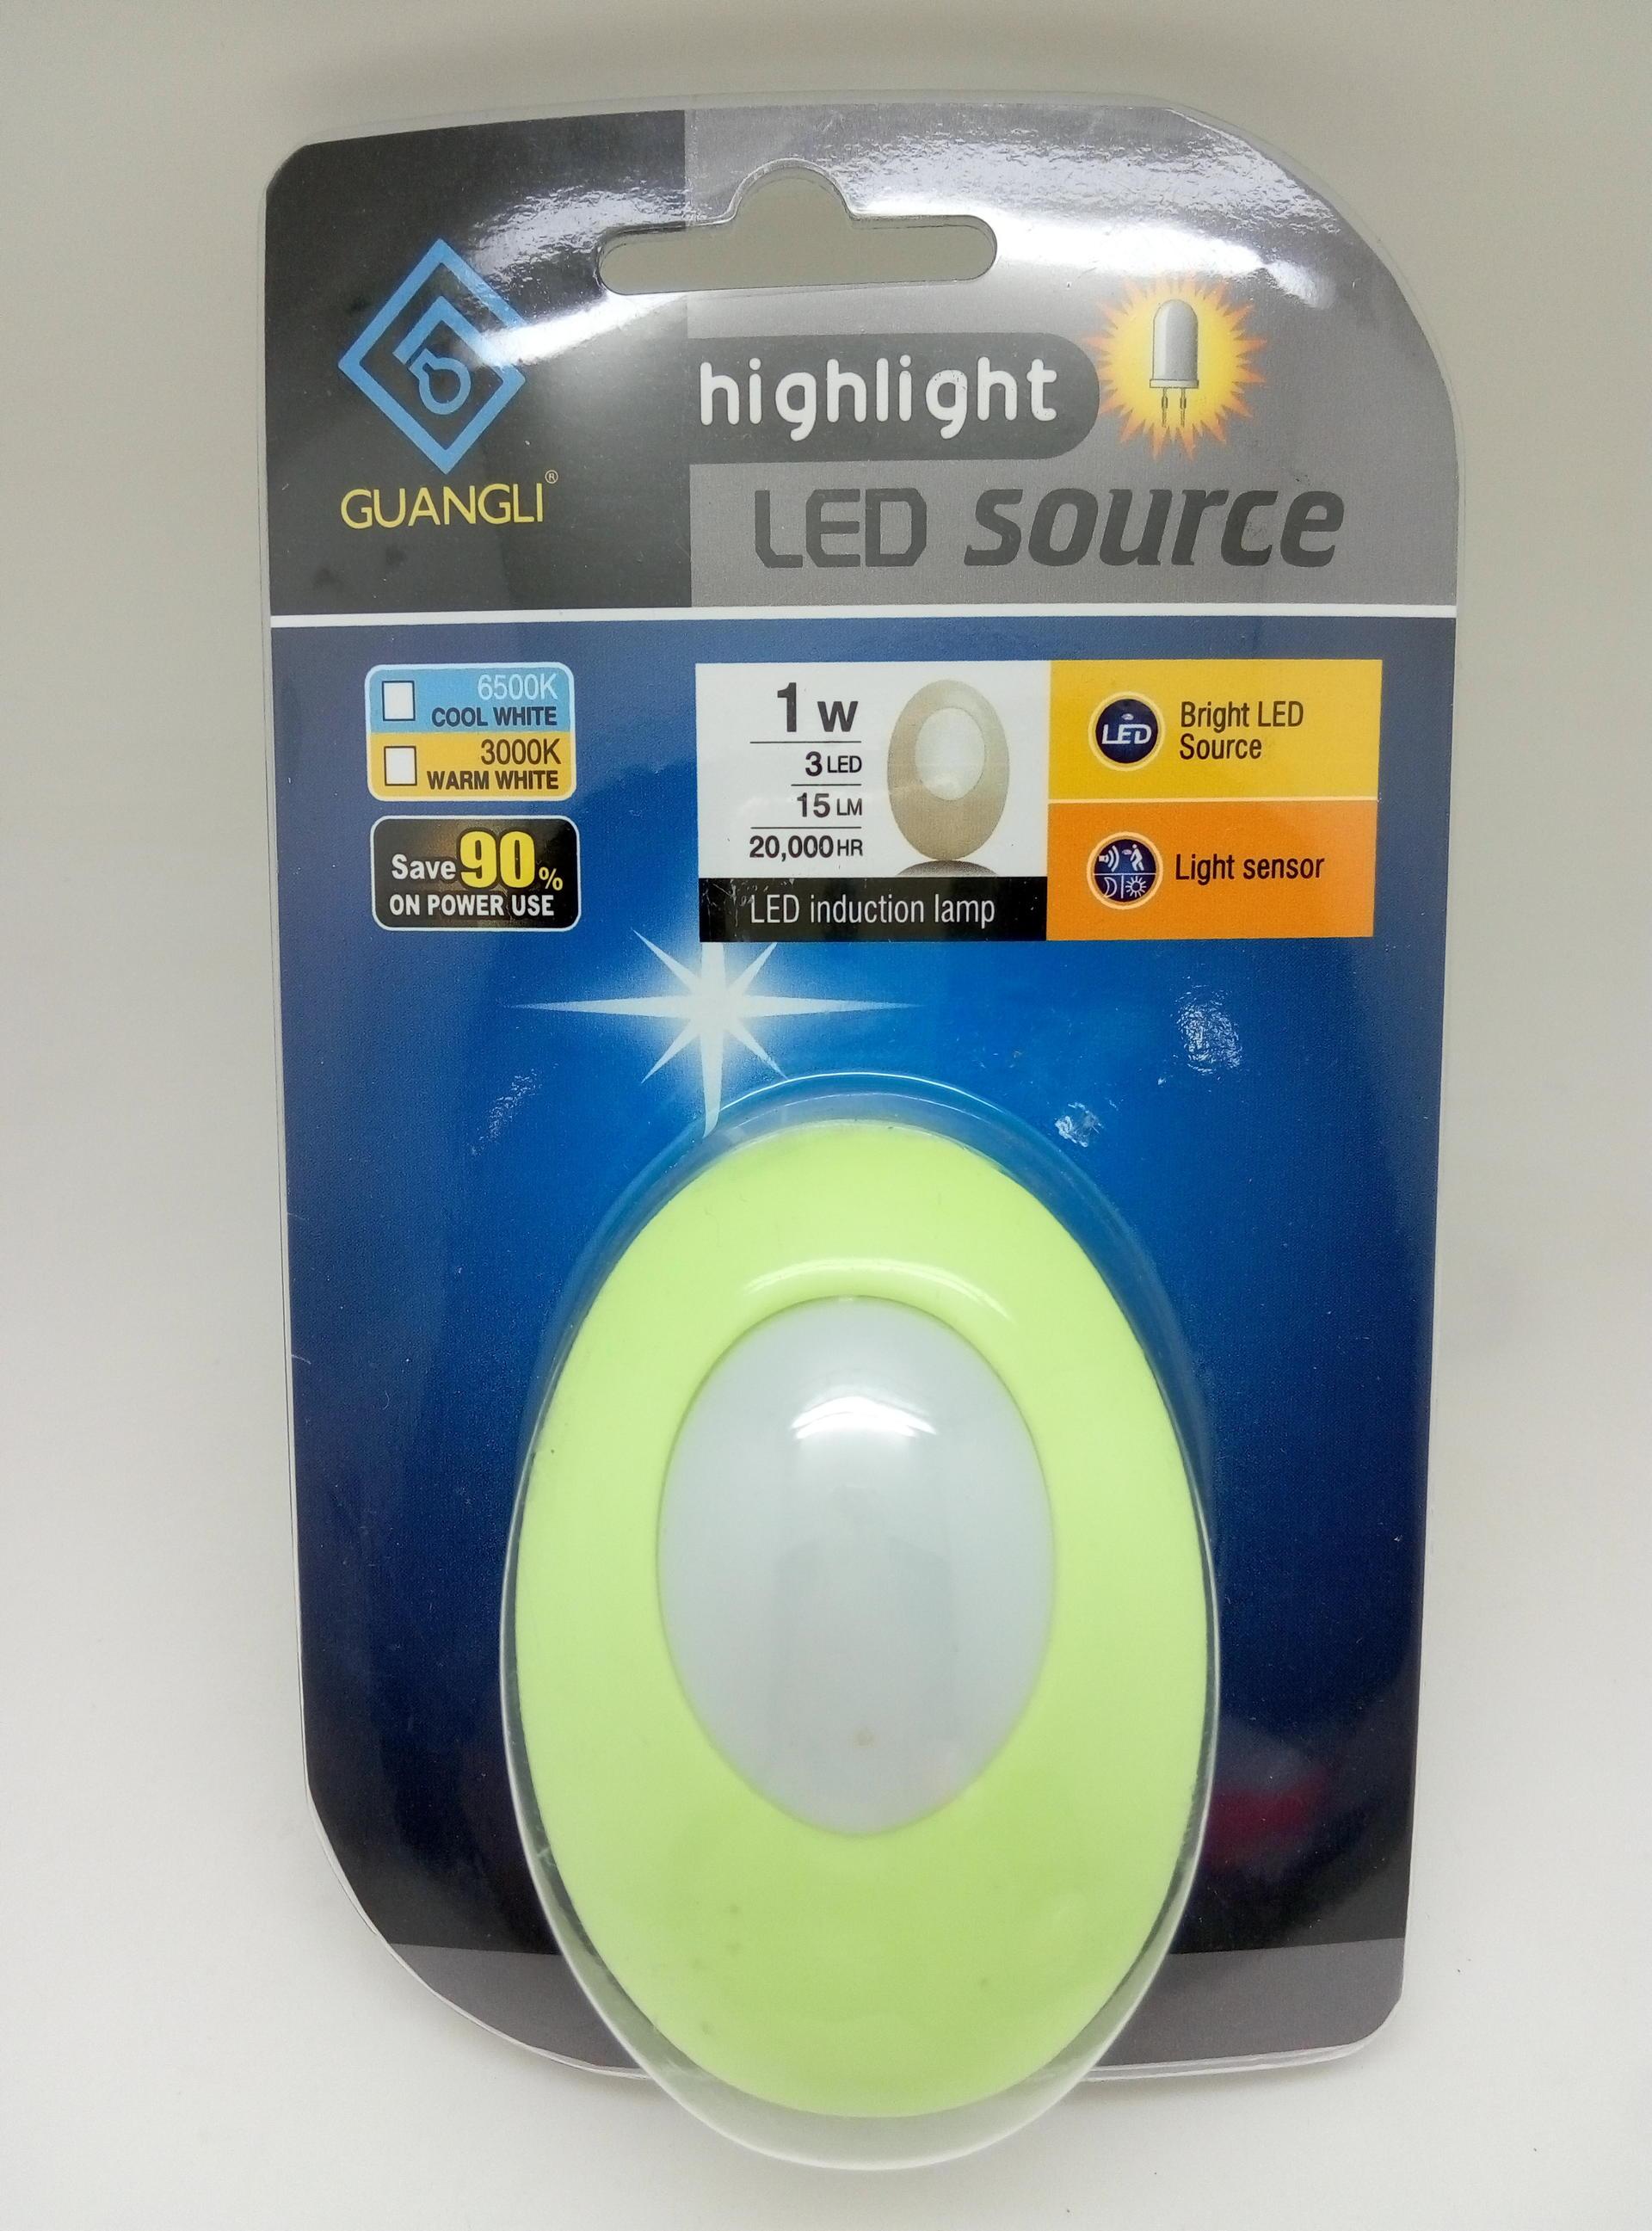 A52 OEM water drop Europe kids CE led sensor plug in dusk to down night light for bedroom